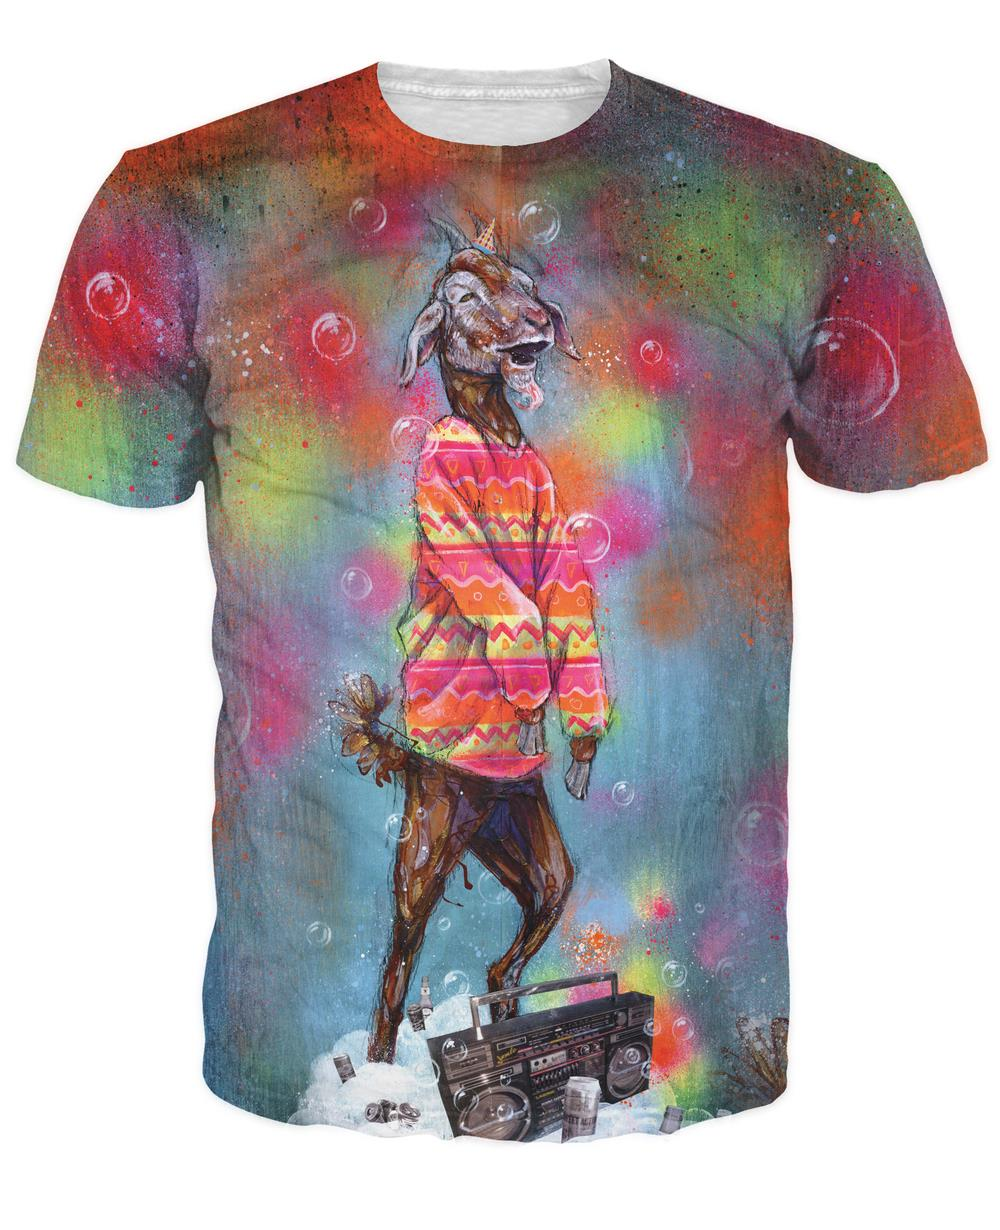 Super fiesta cabra camiseta enfermo hombres camiseta cabra Billy Hipster rockeando Boombox camisa psicodélica mujer Sexy T camisa